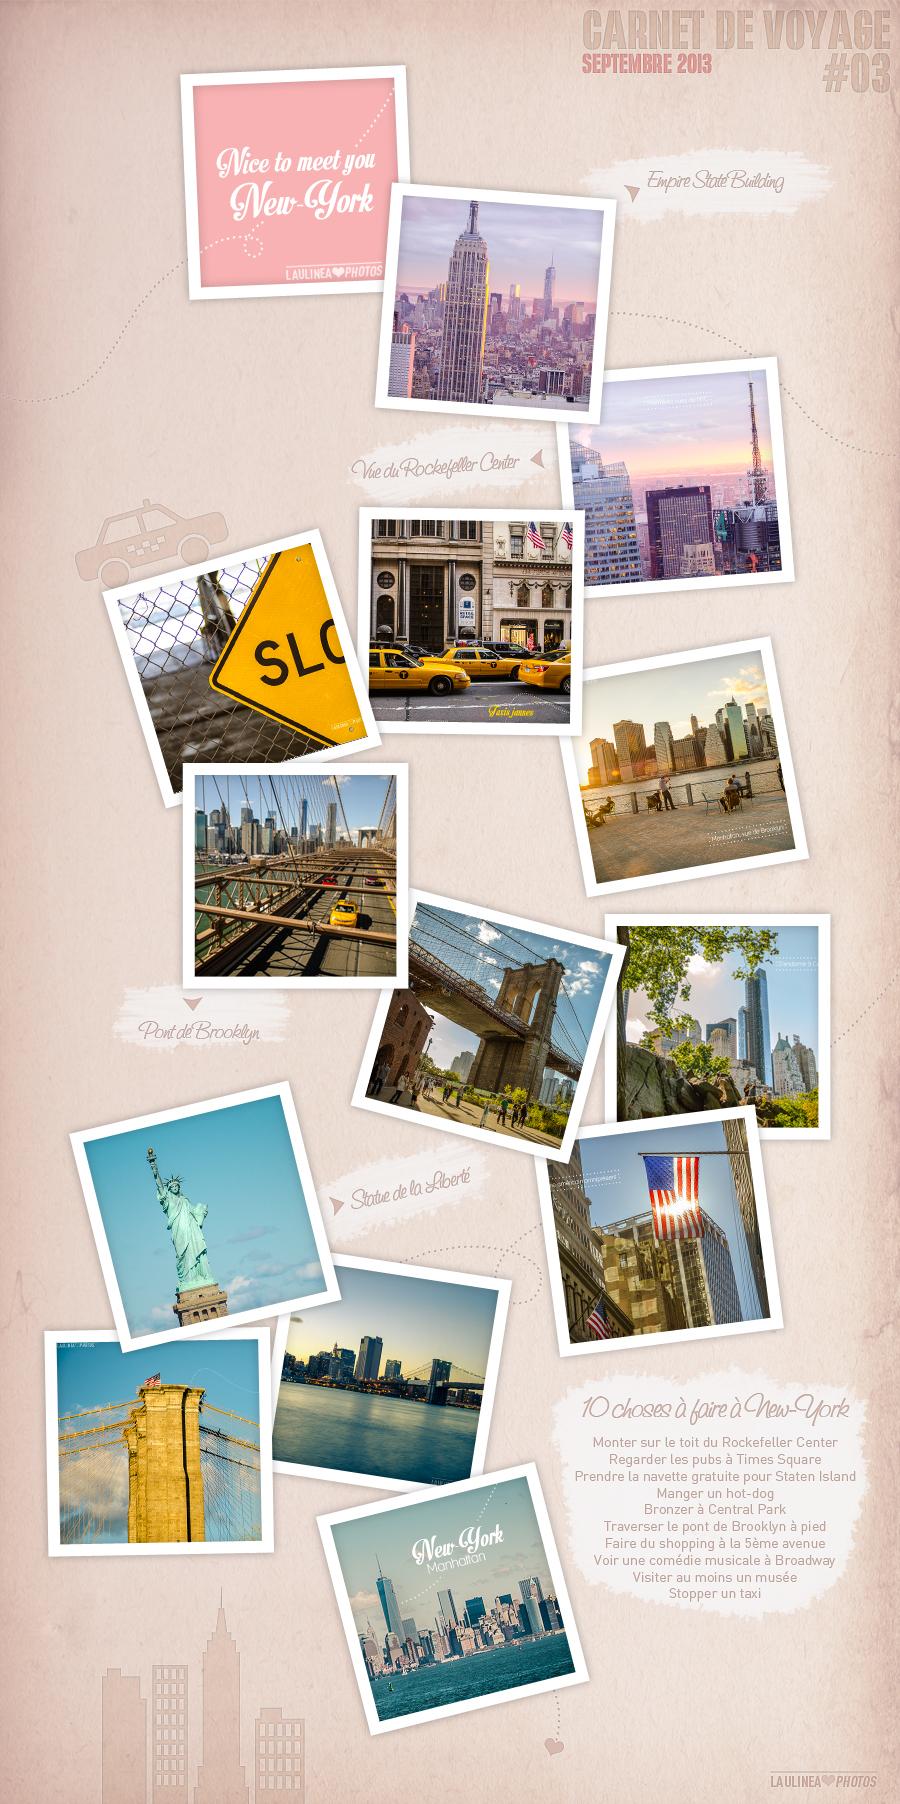 brooklyn, central park, manhattan, New-York, rockfeller center, statue de la liberté, usa, vacances, voyage, week-end, carnet de voyage